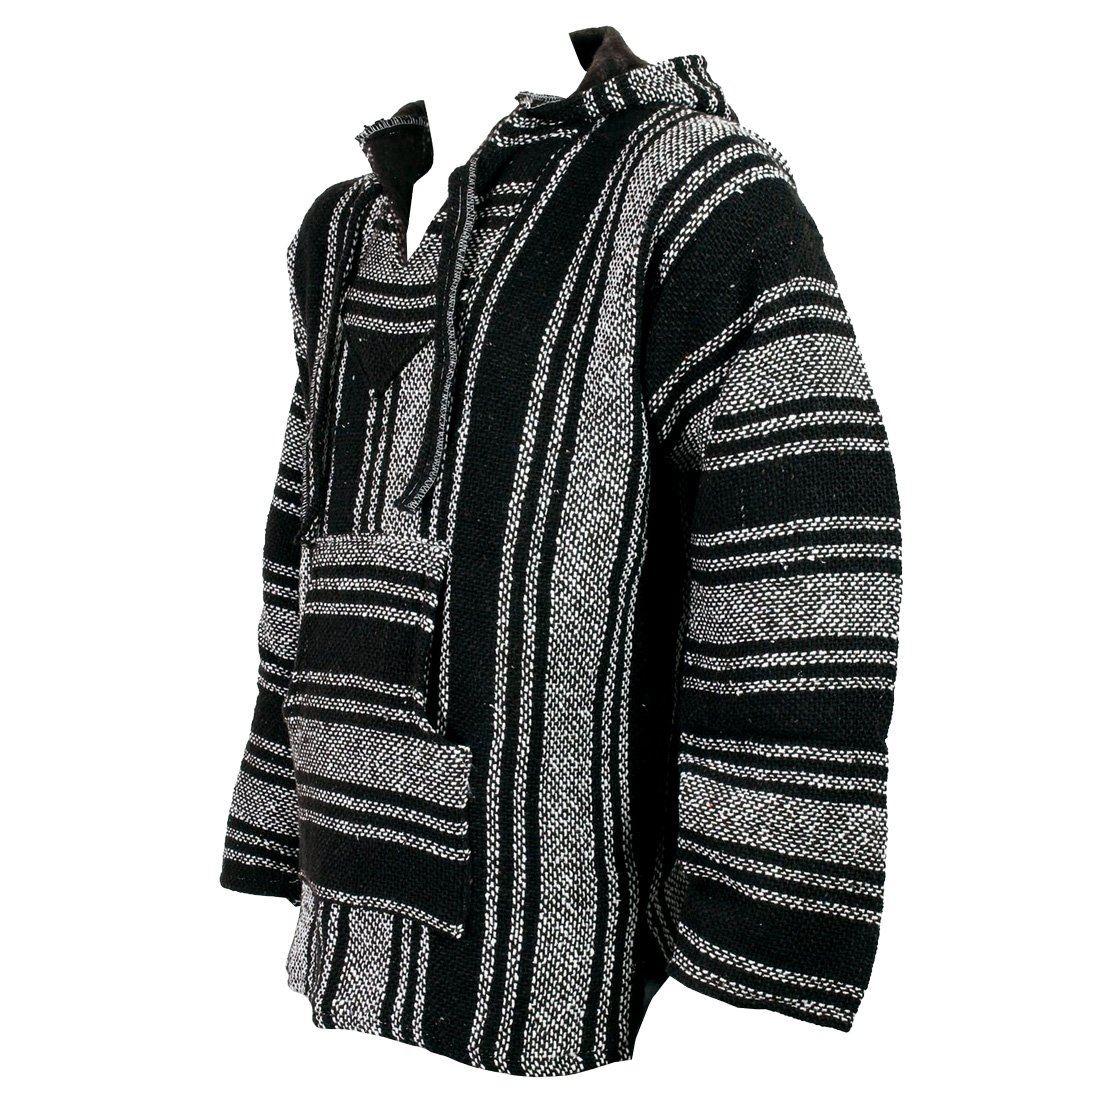 Where to buy baja hoodies